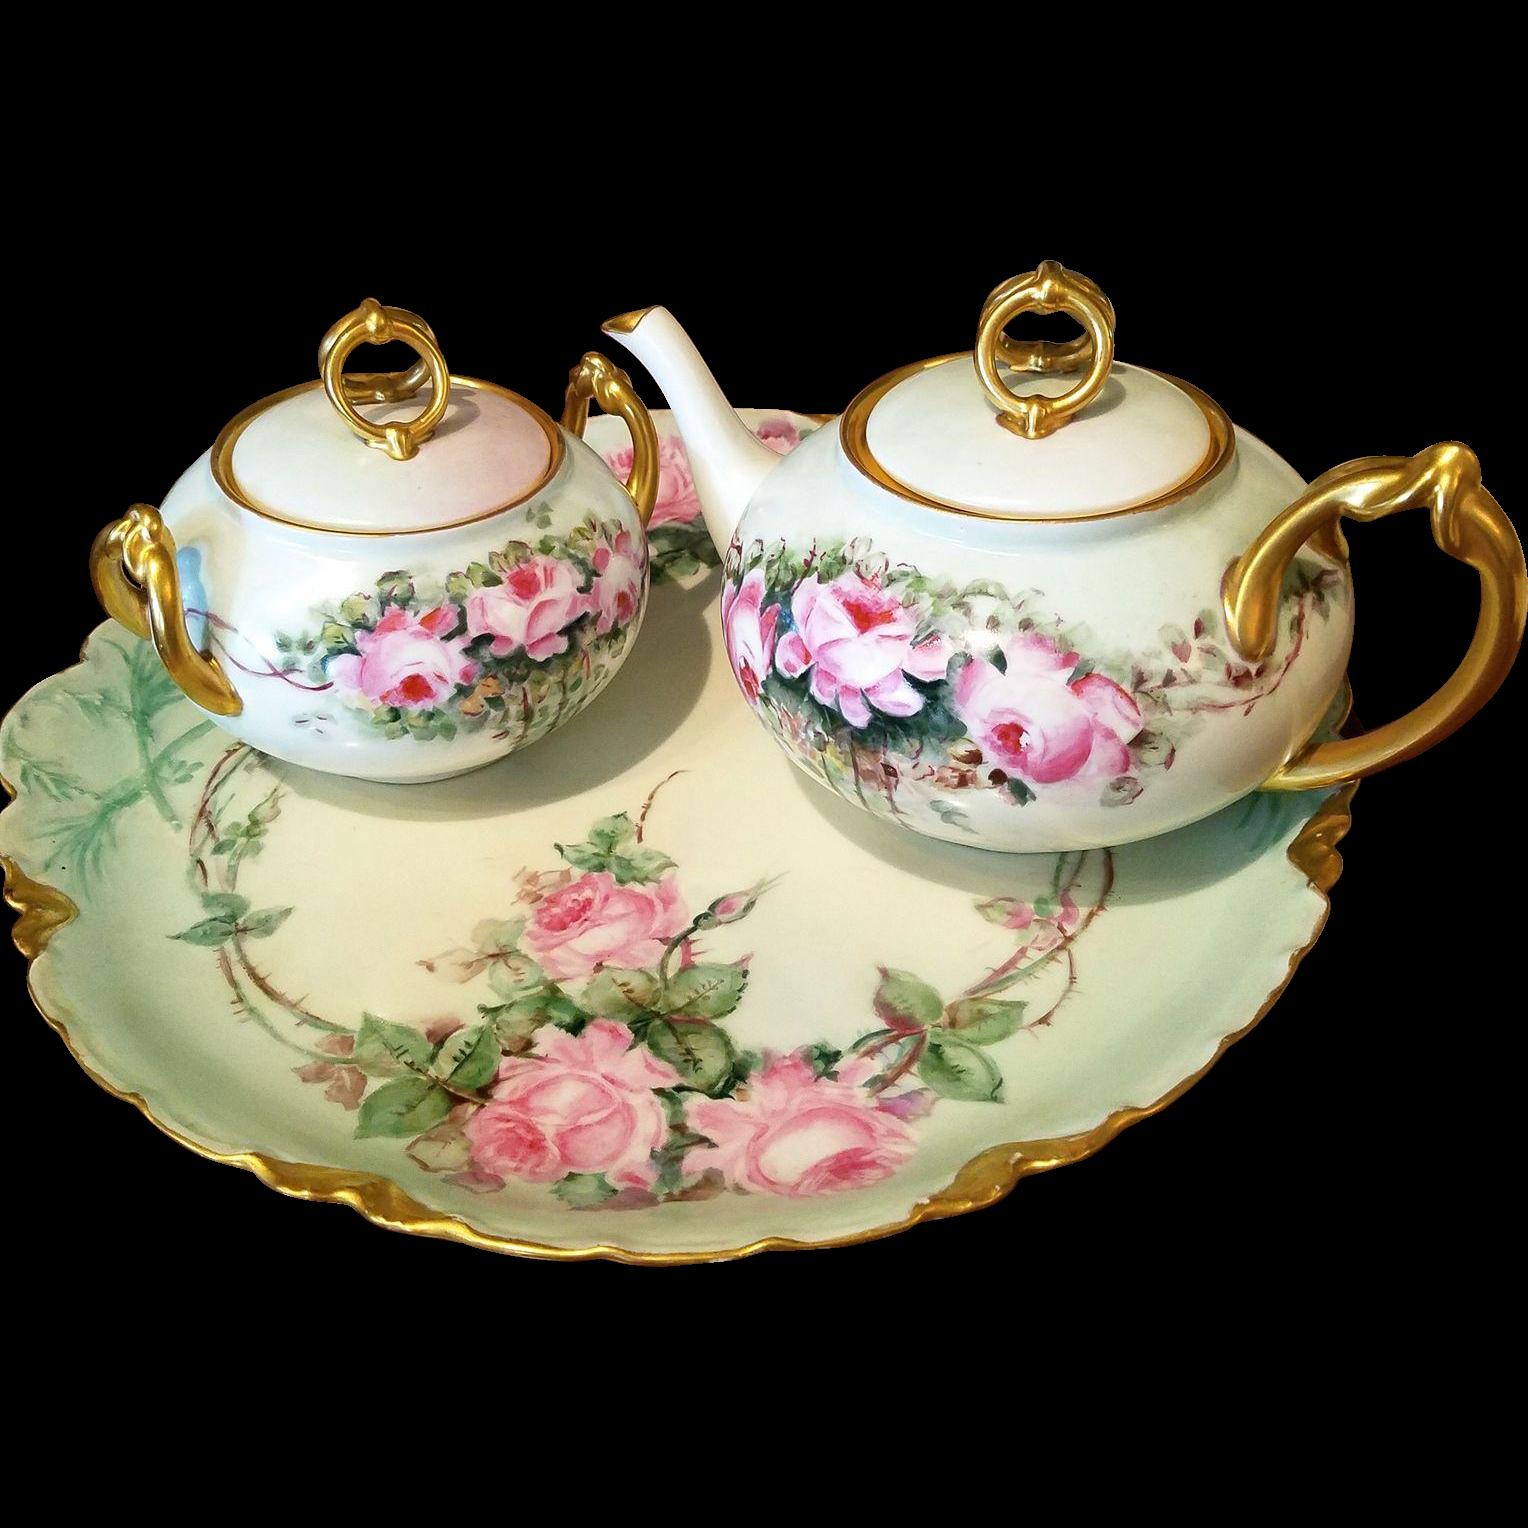 Limoges Hand Painted Rose Tea Pot Sugar Bowl Set, Favorite